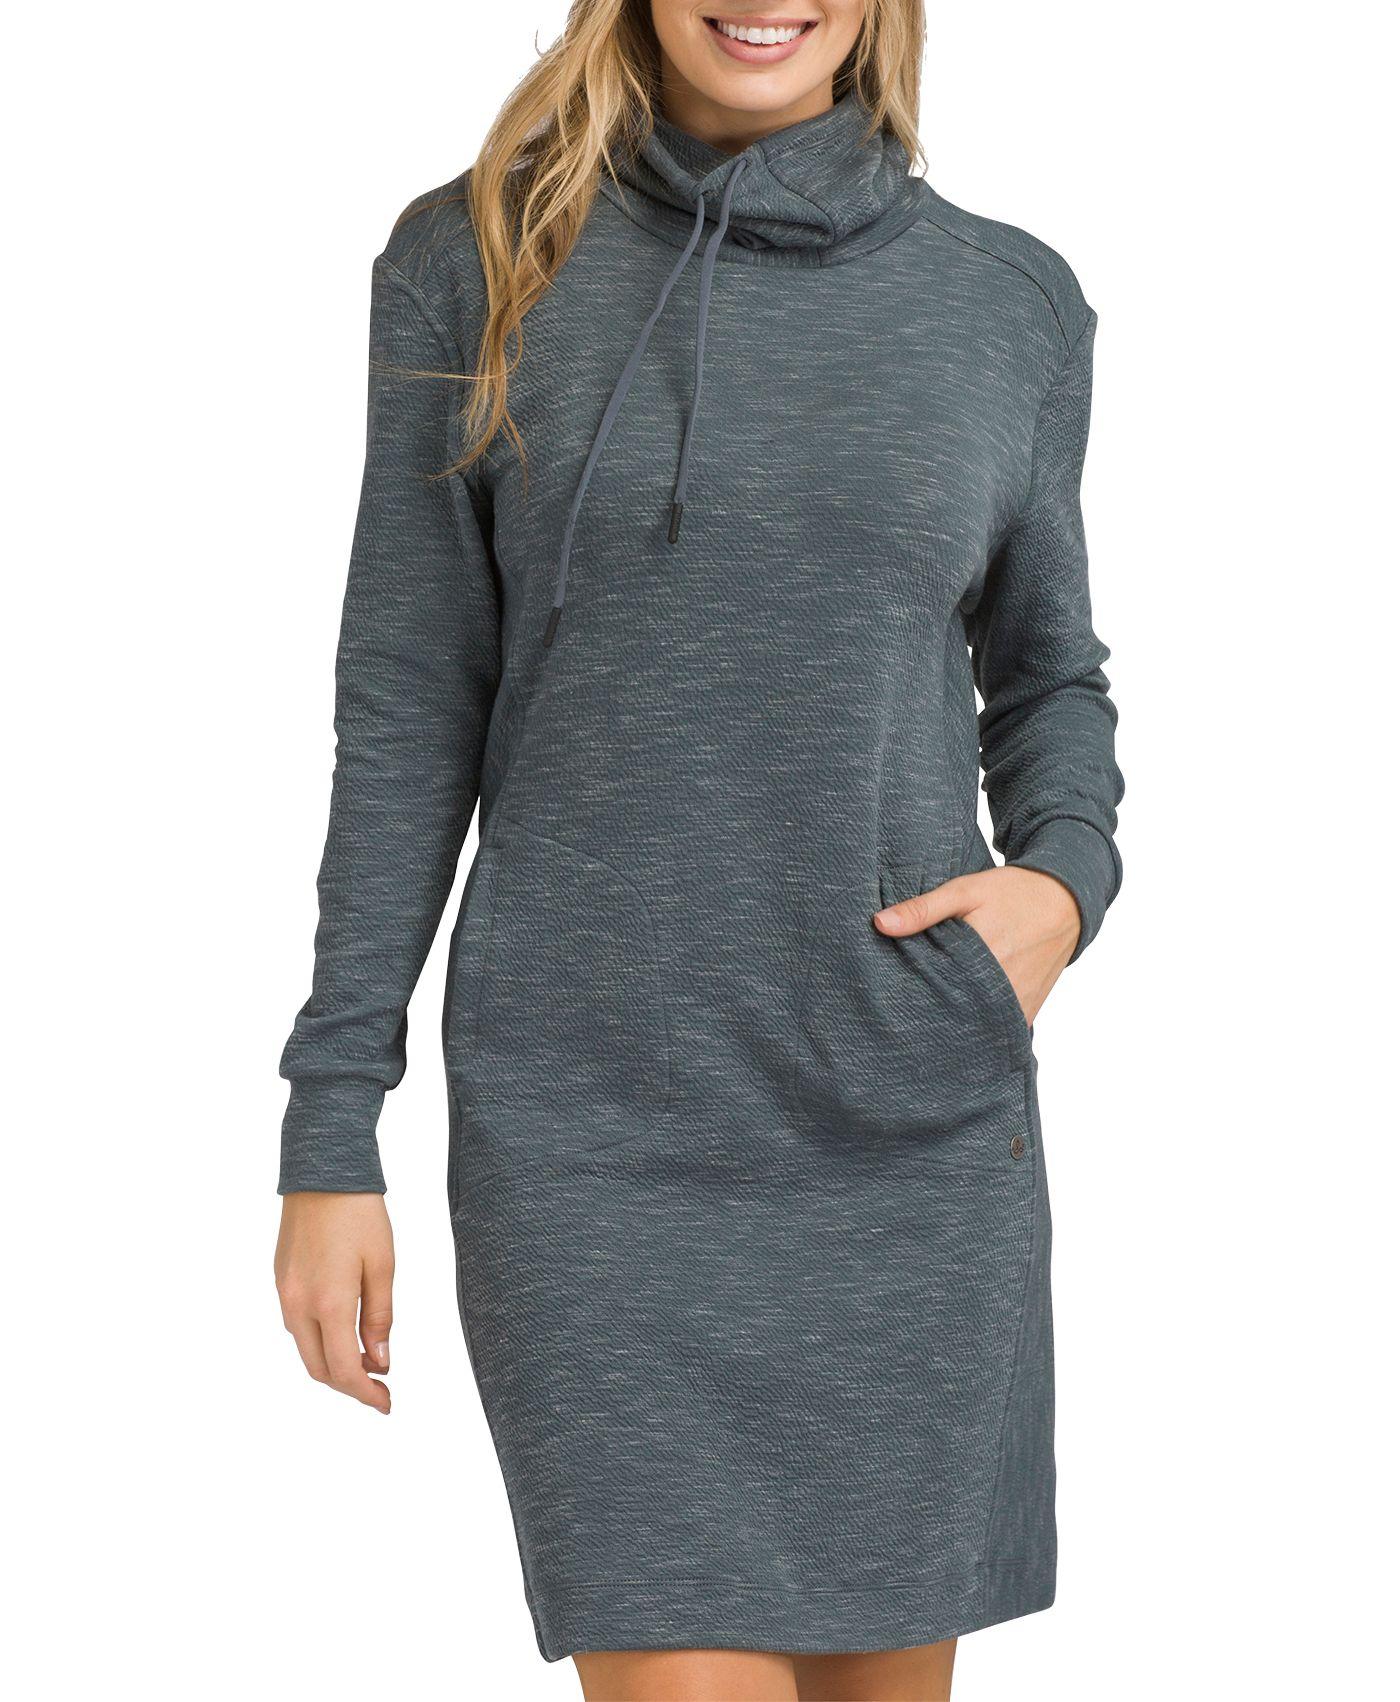 prAna Women's Sunrise Dress